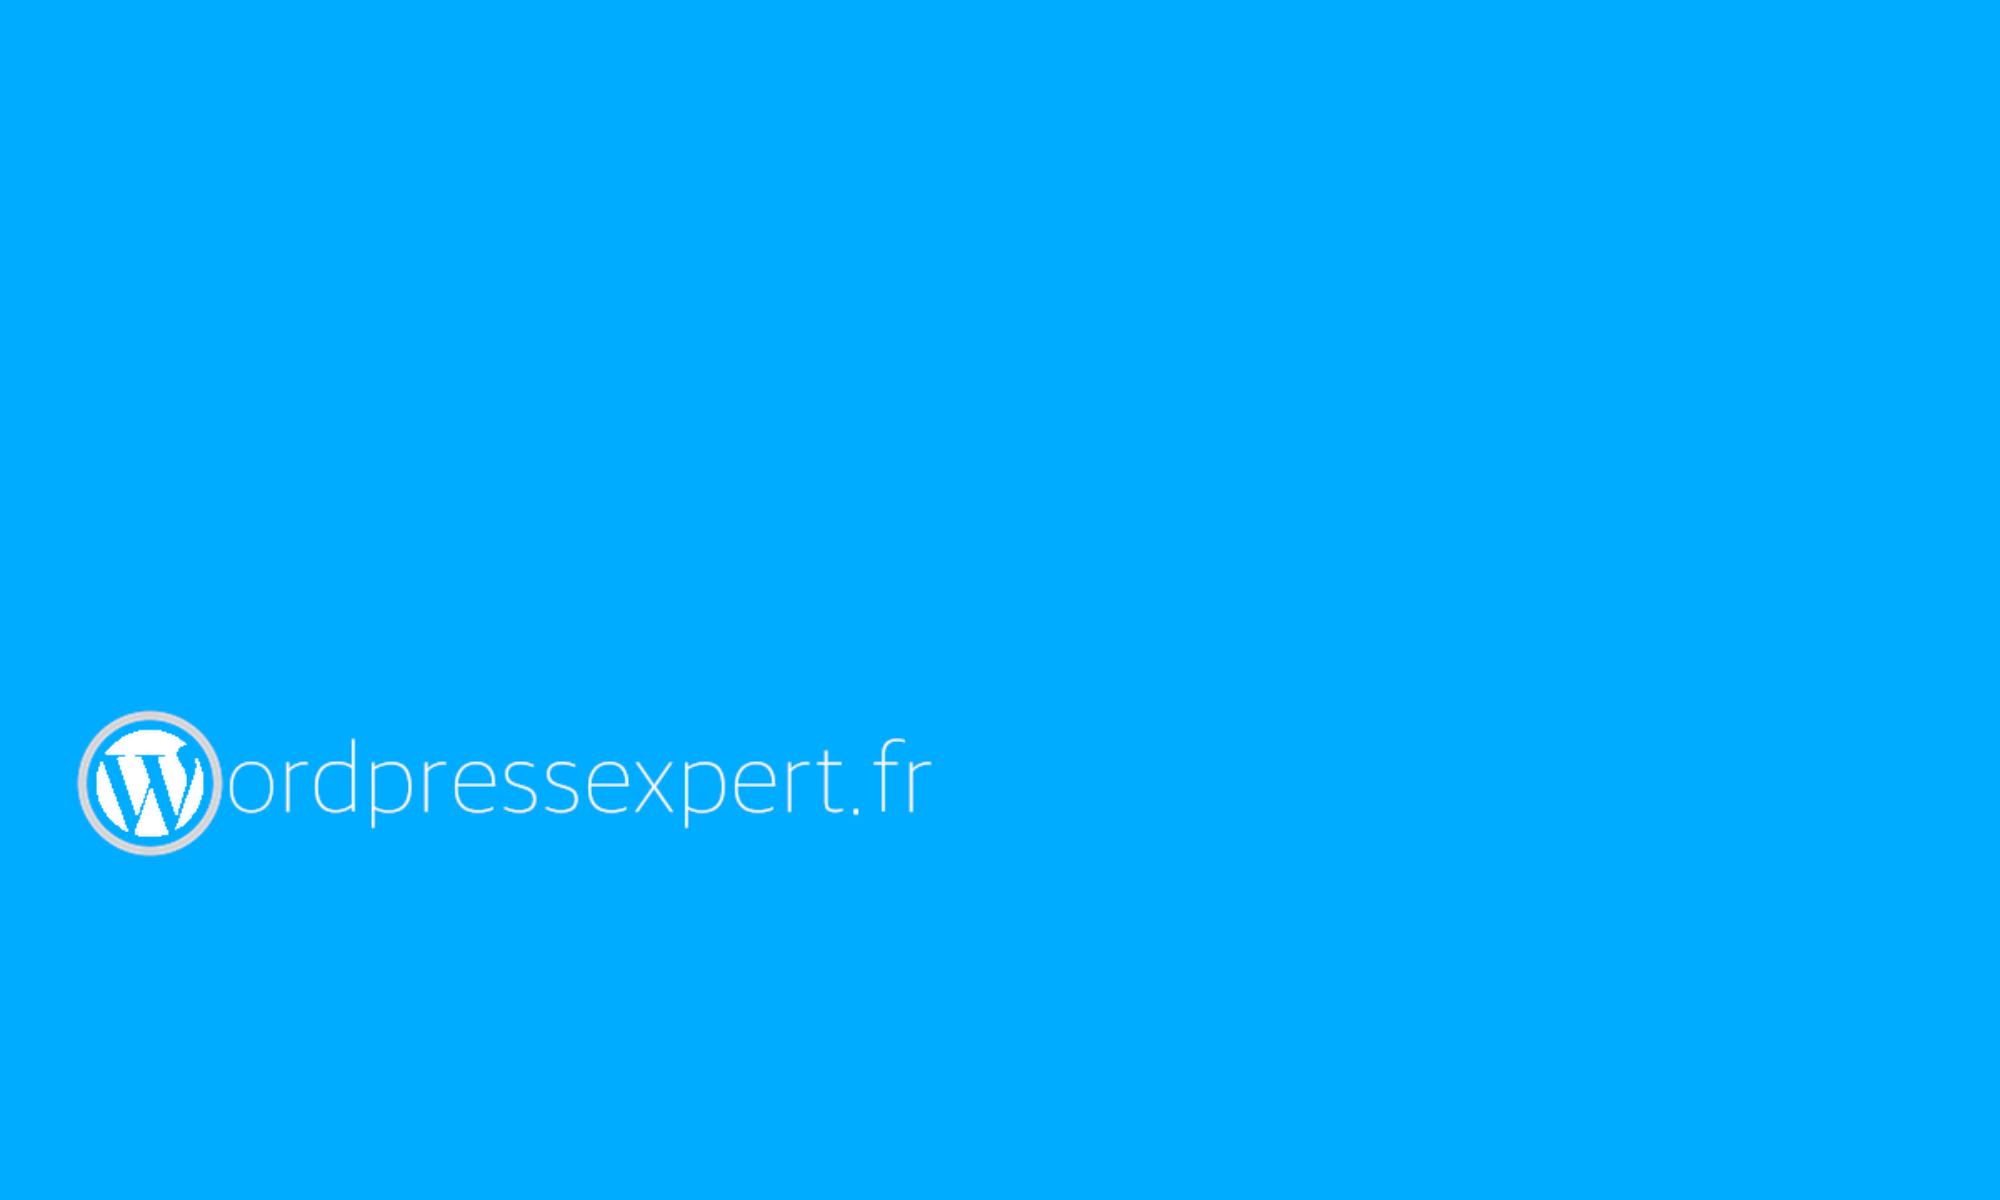 WORDPRESS EXPERT